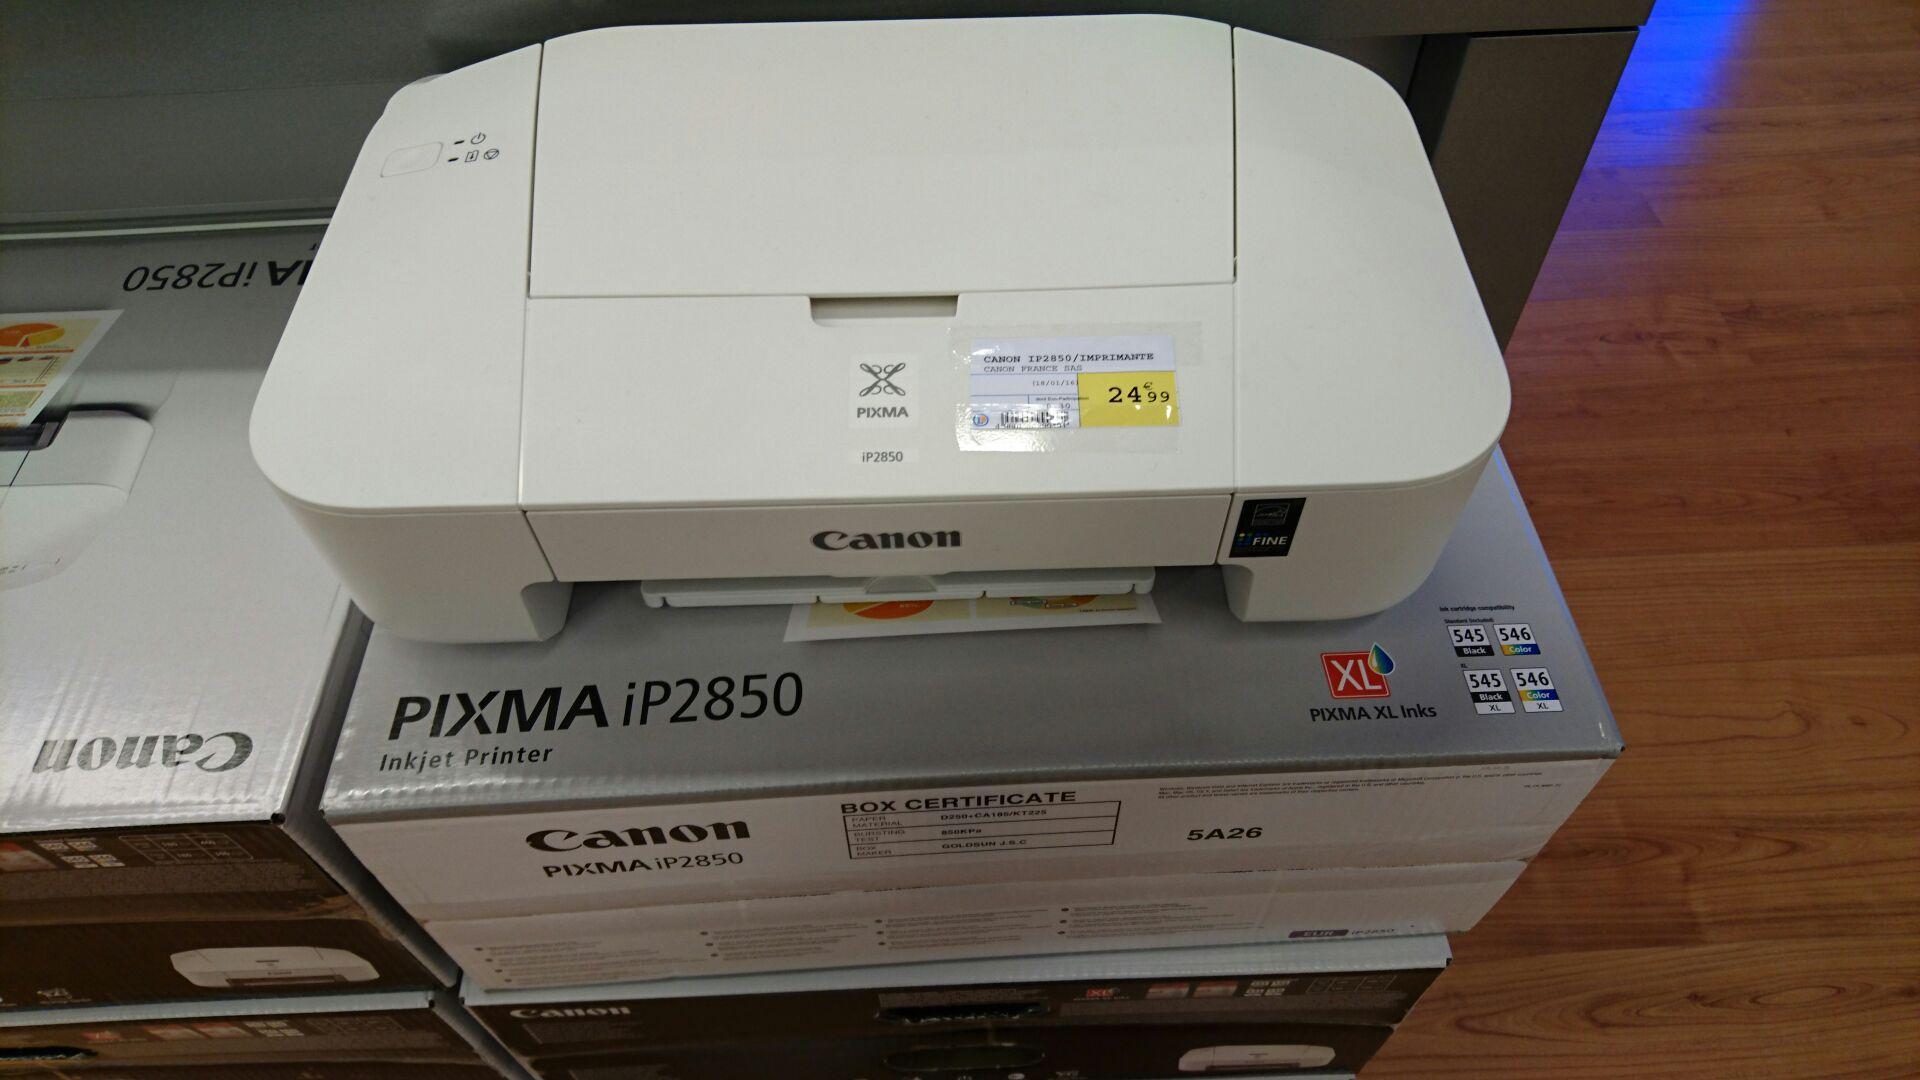 Imprimante Canon Pixma IP2850